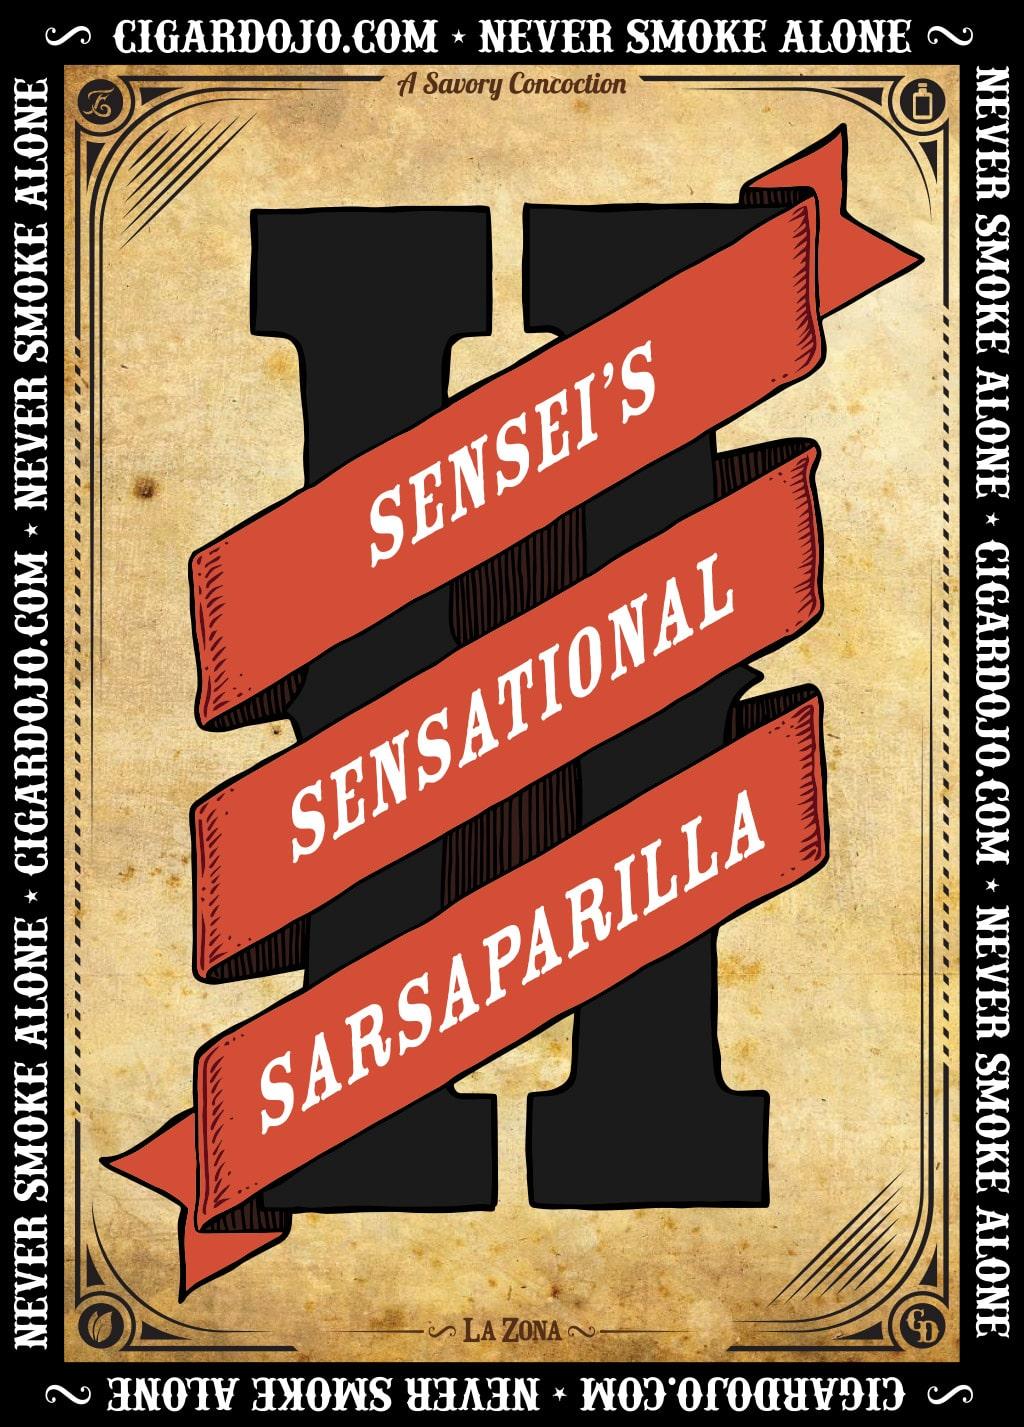 Sensei's Sensational Sarsaparilla II cigar label